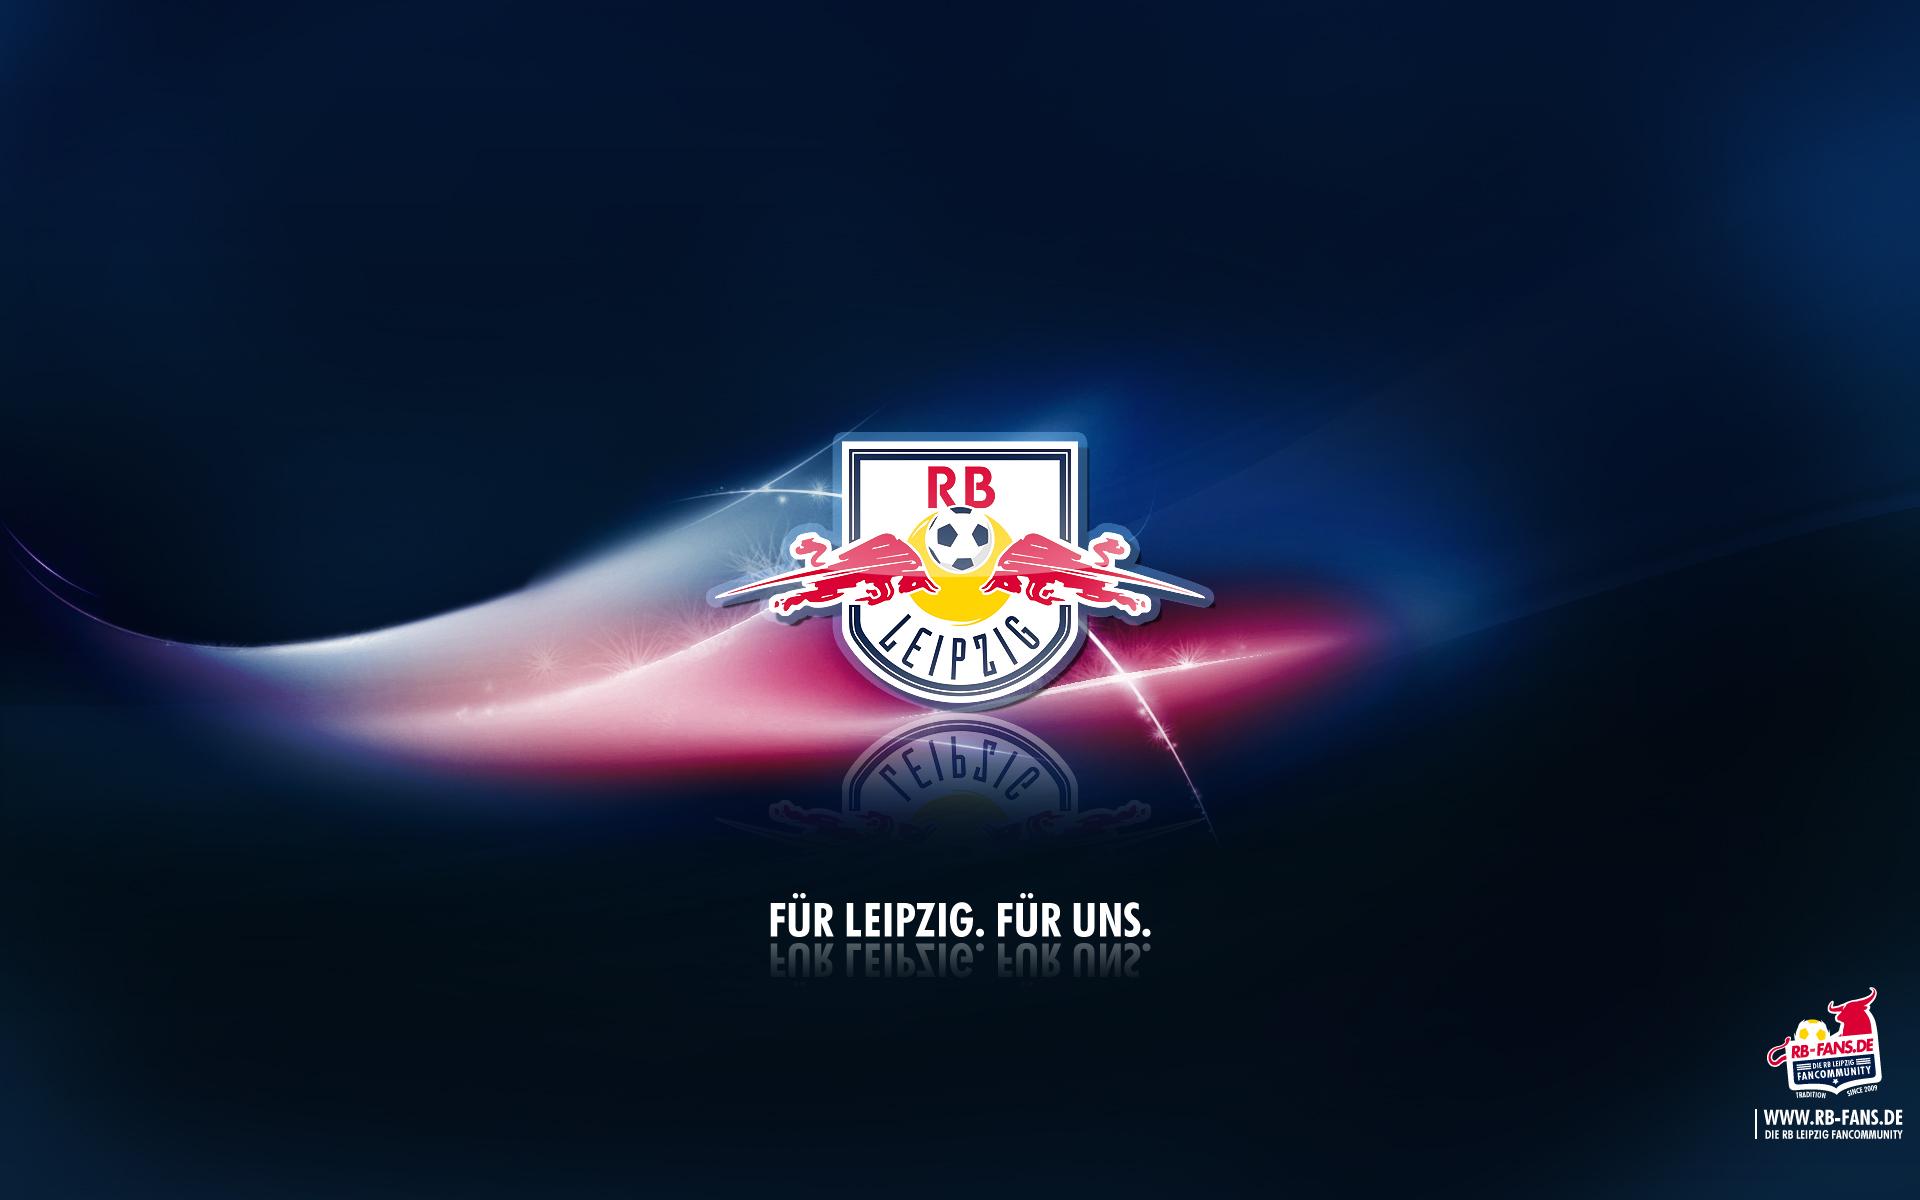 RB-Fans.de - Die RB Leipzig Fancommunity